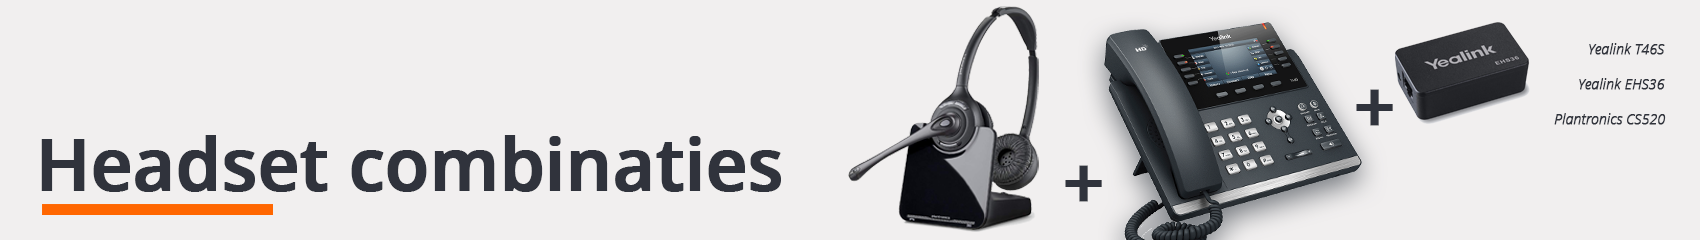 Zakelijke headsets